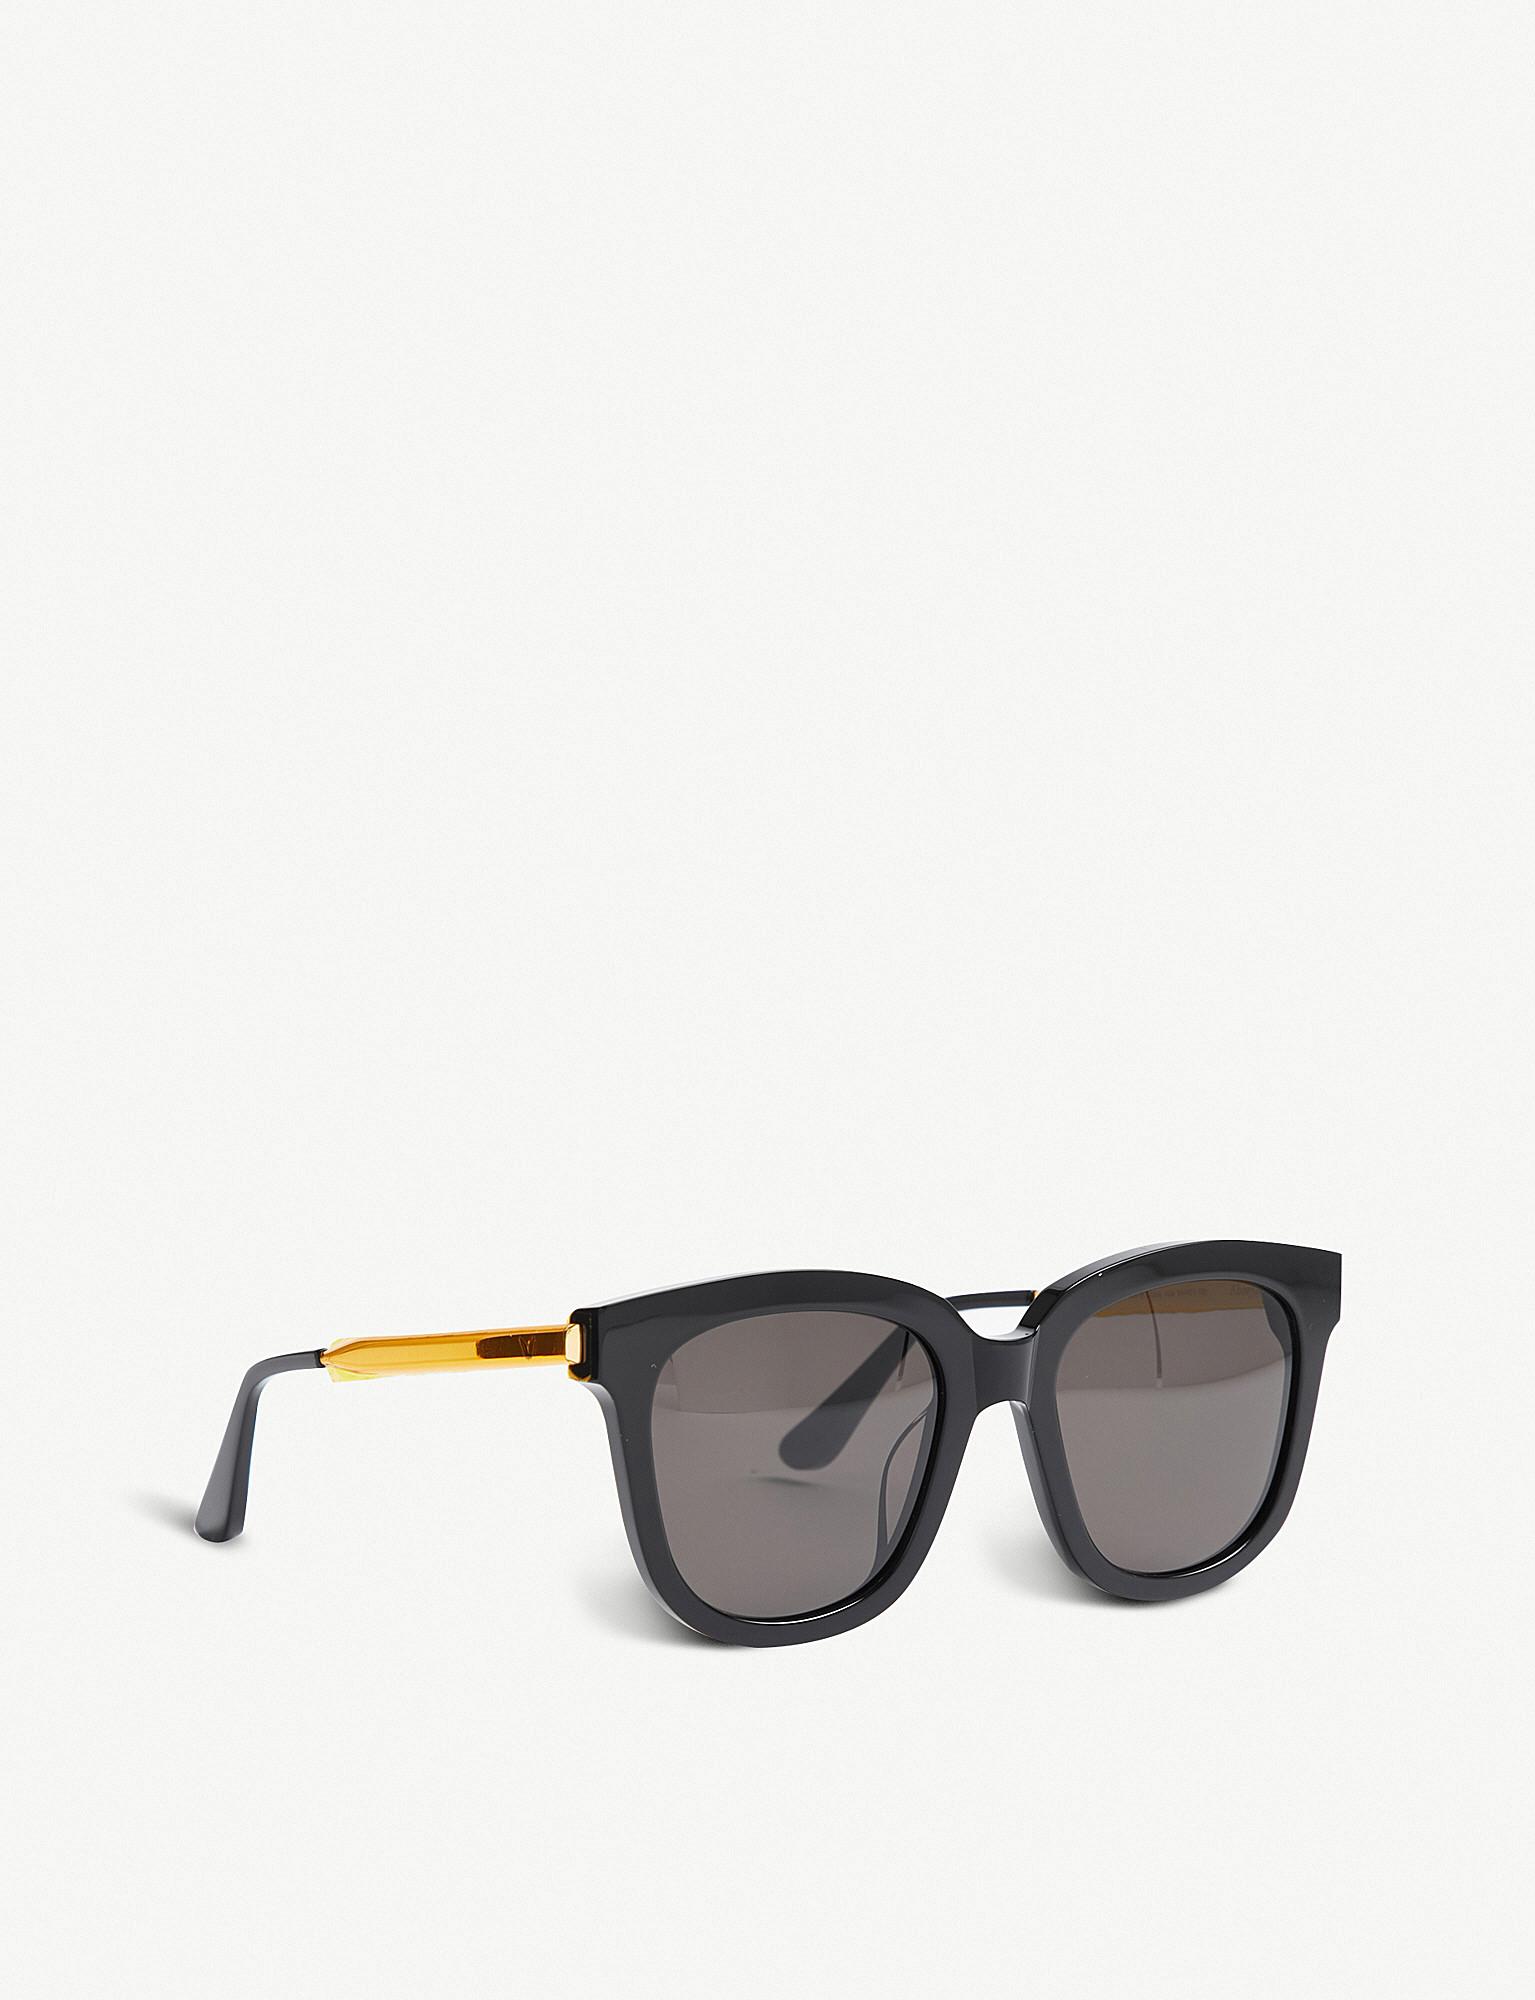 08e688964d88 GENTLE MONSTER - Absente acetate sunglasses